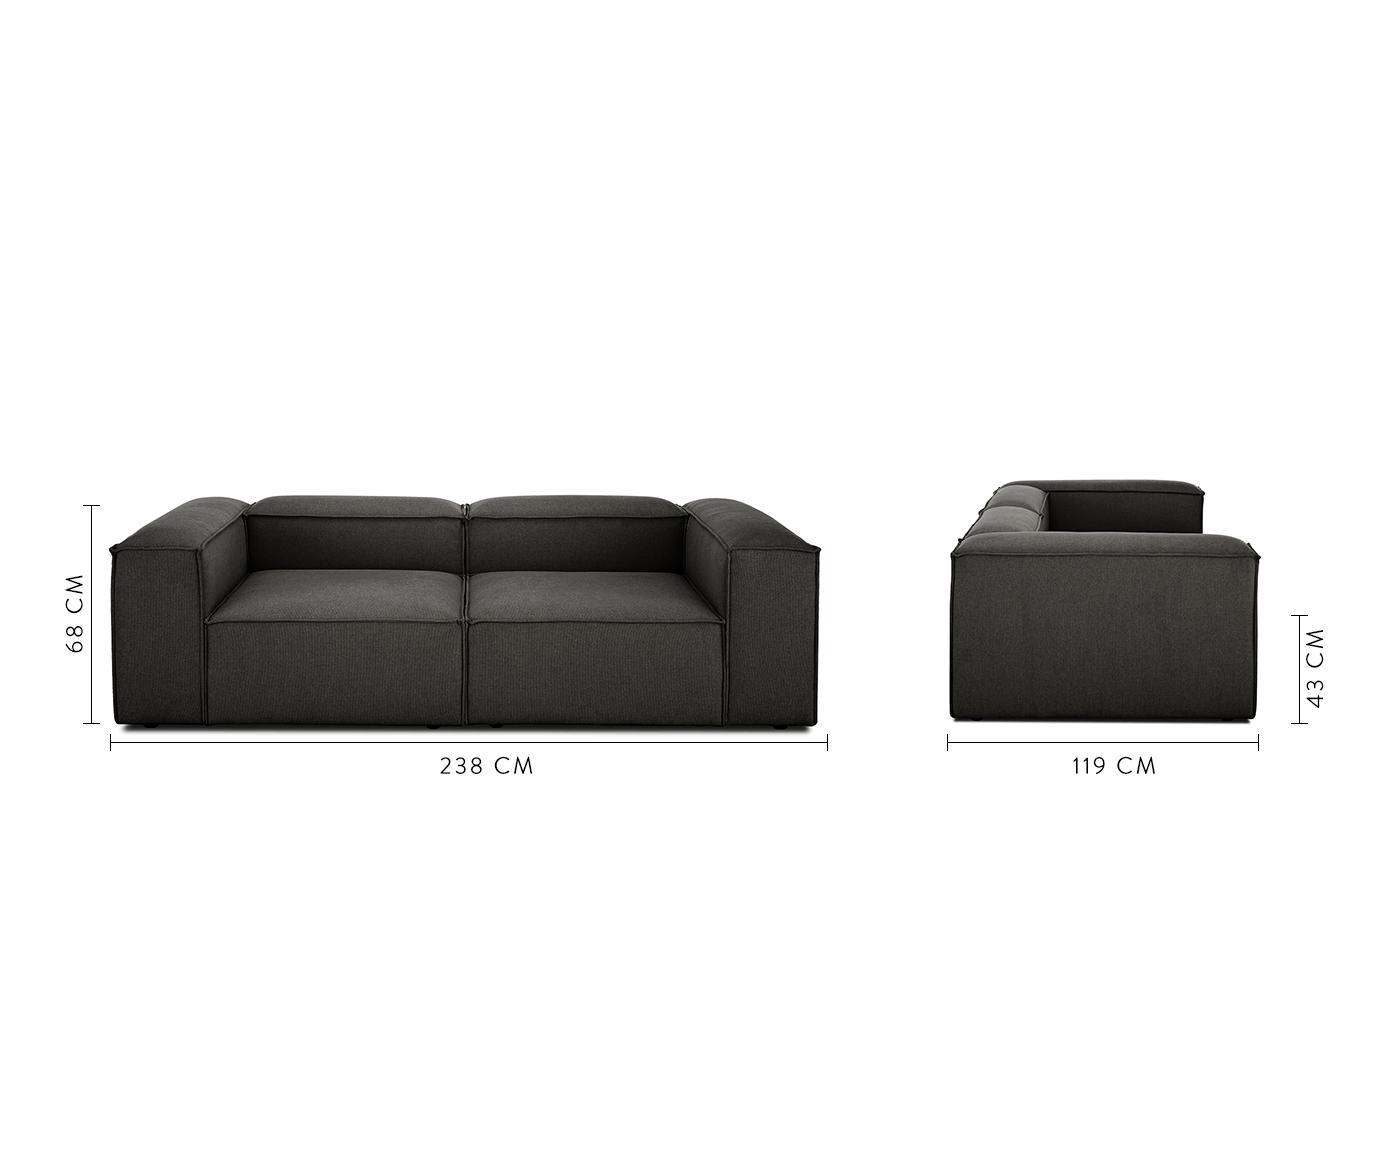 Modulaire bank Lennon (3-zits), Bekleding: polyester, Frame: massief grenenhout, multi, Poten: kunststof, Antraciet, B 238 x D 119 cm